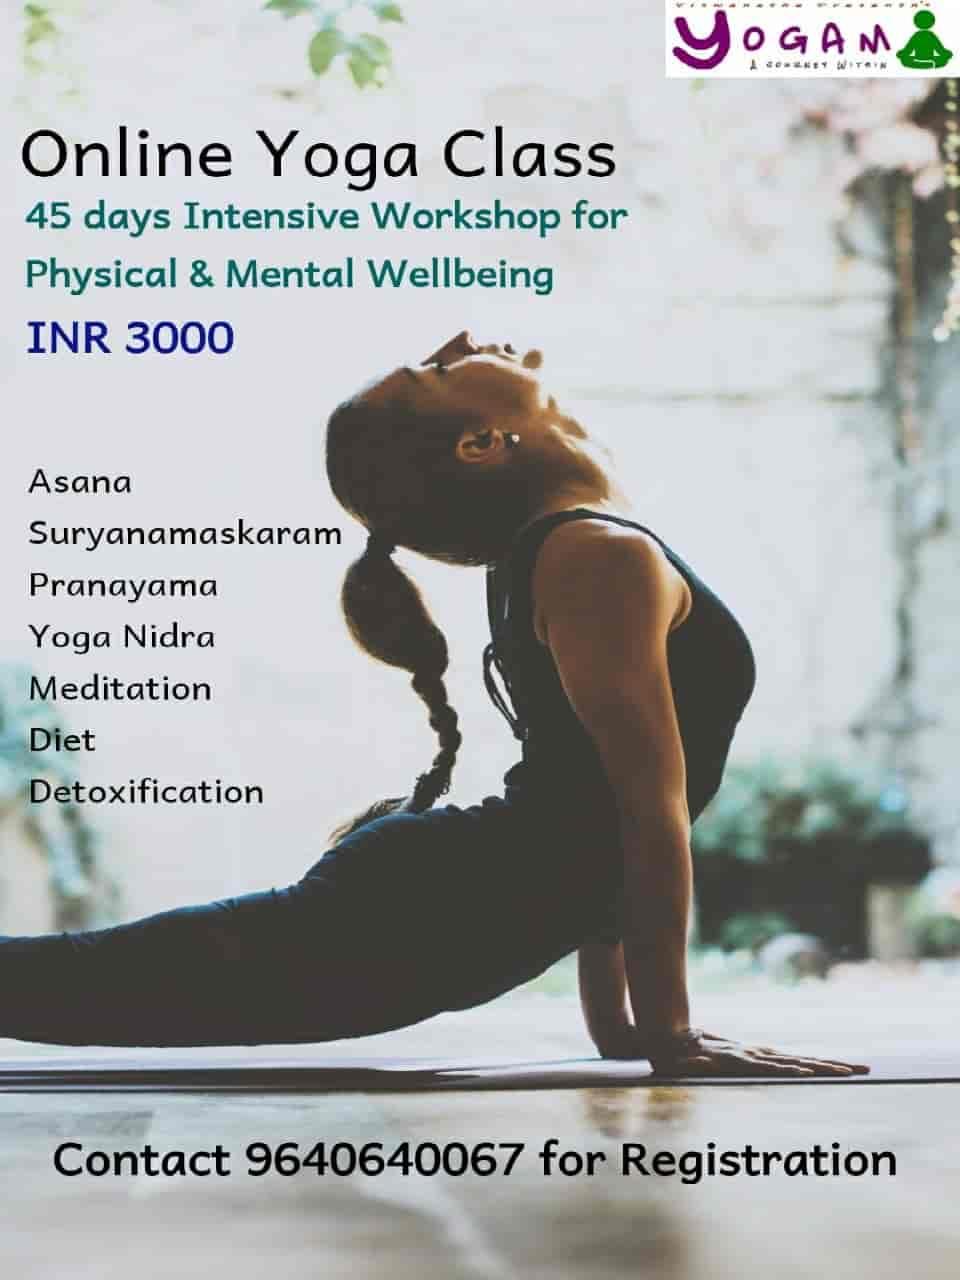 Viswanatha Prasanth S Yogam Fitness Ameenpur Road Yoga Classes In Hyderabad Justdial